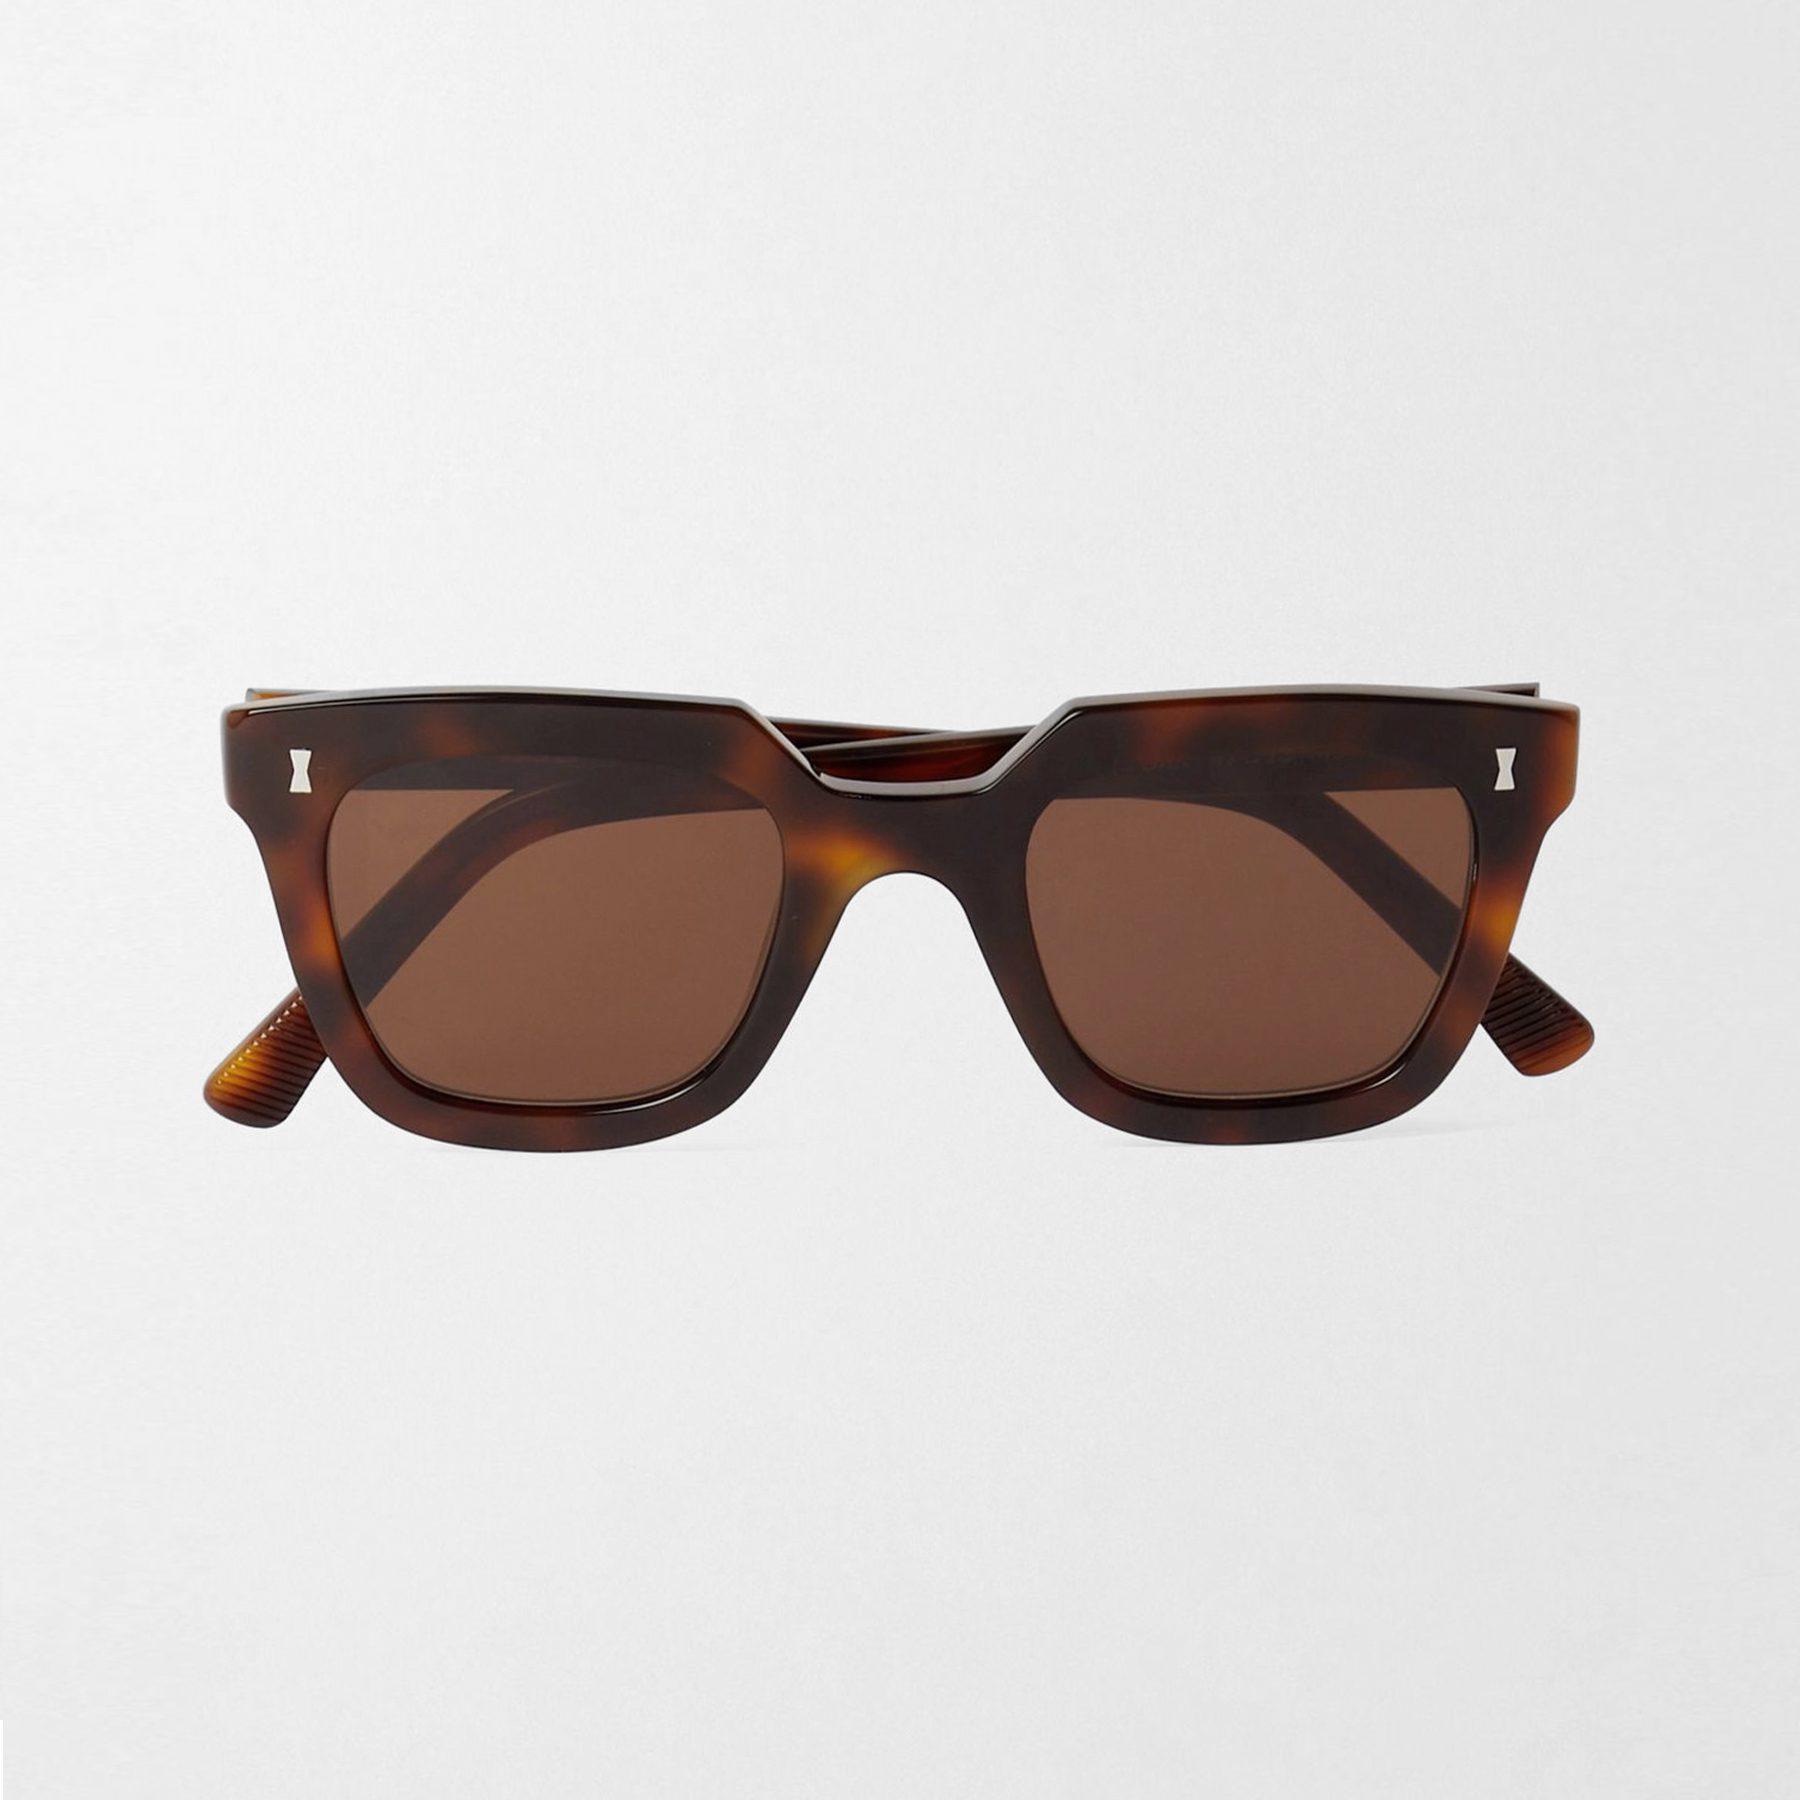 Cubitts Balfour Sunglasses